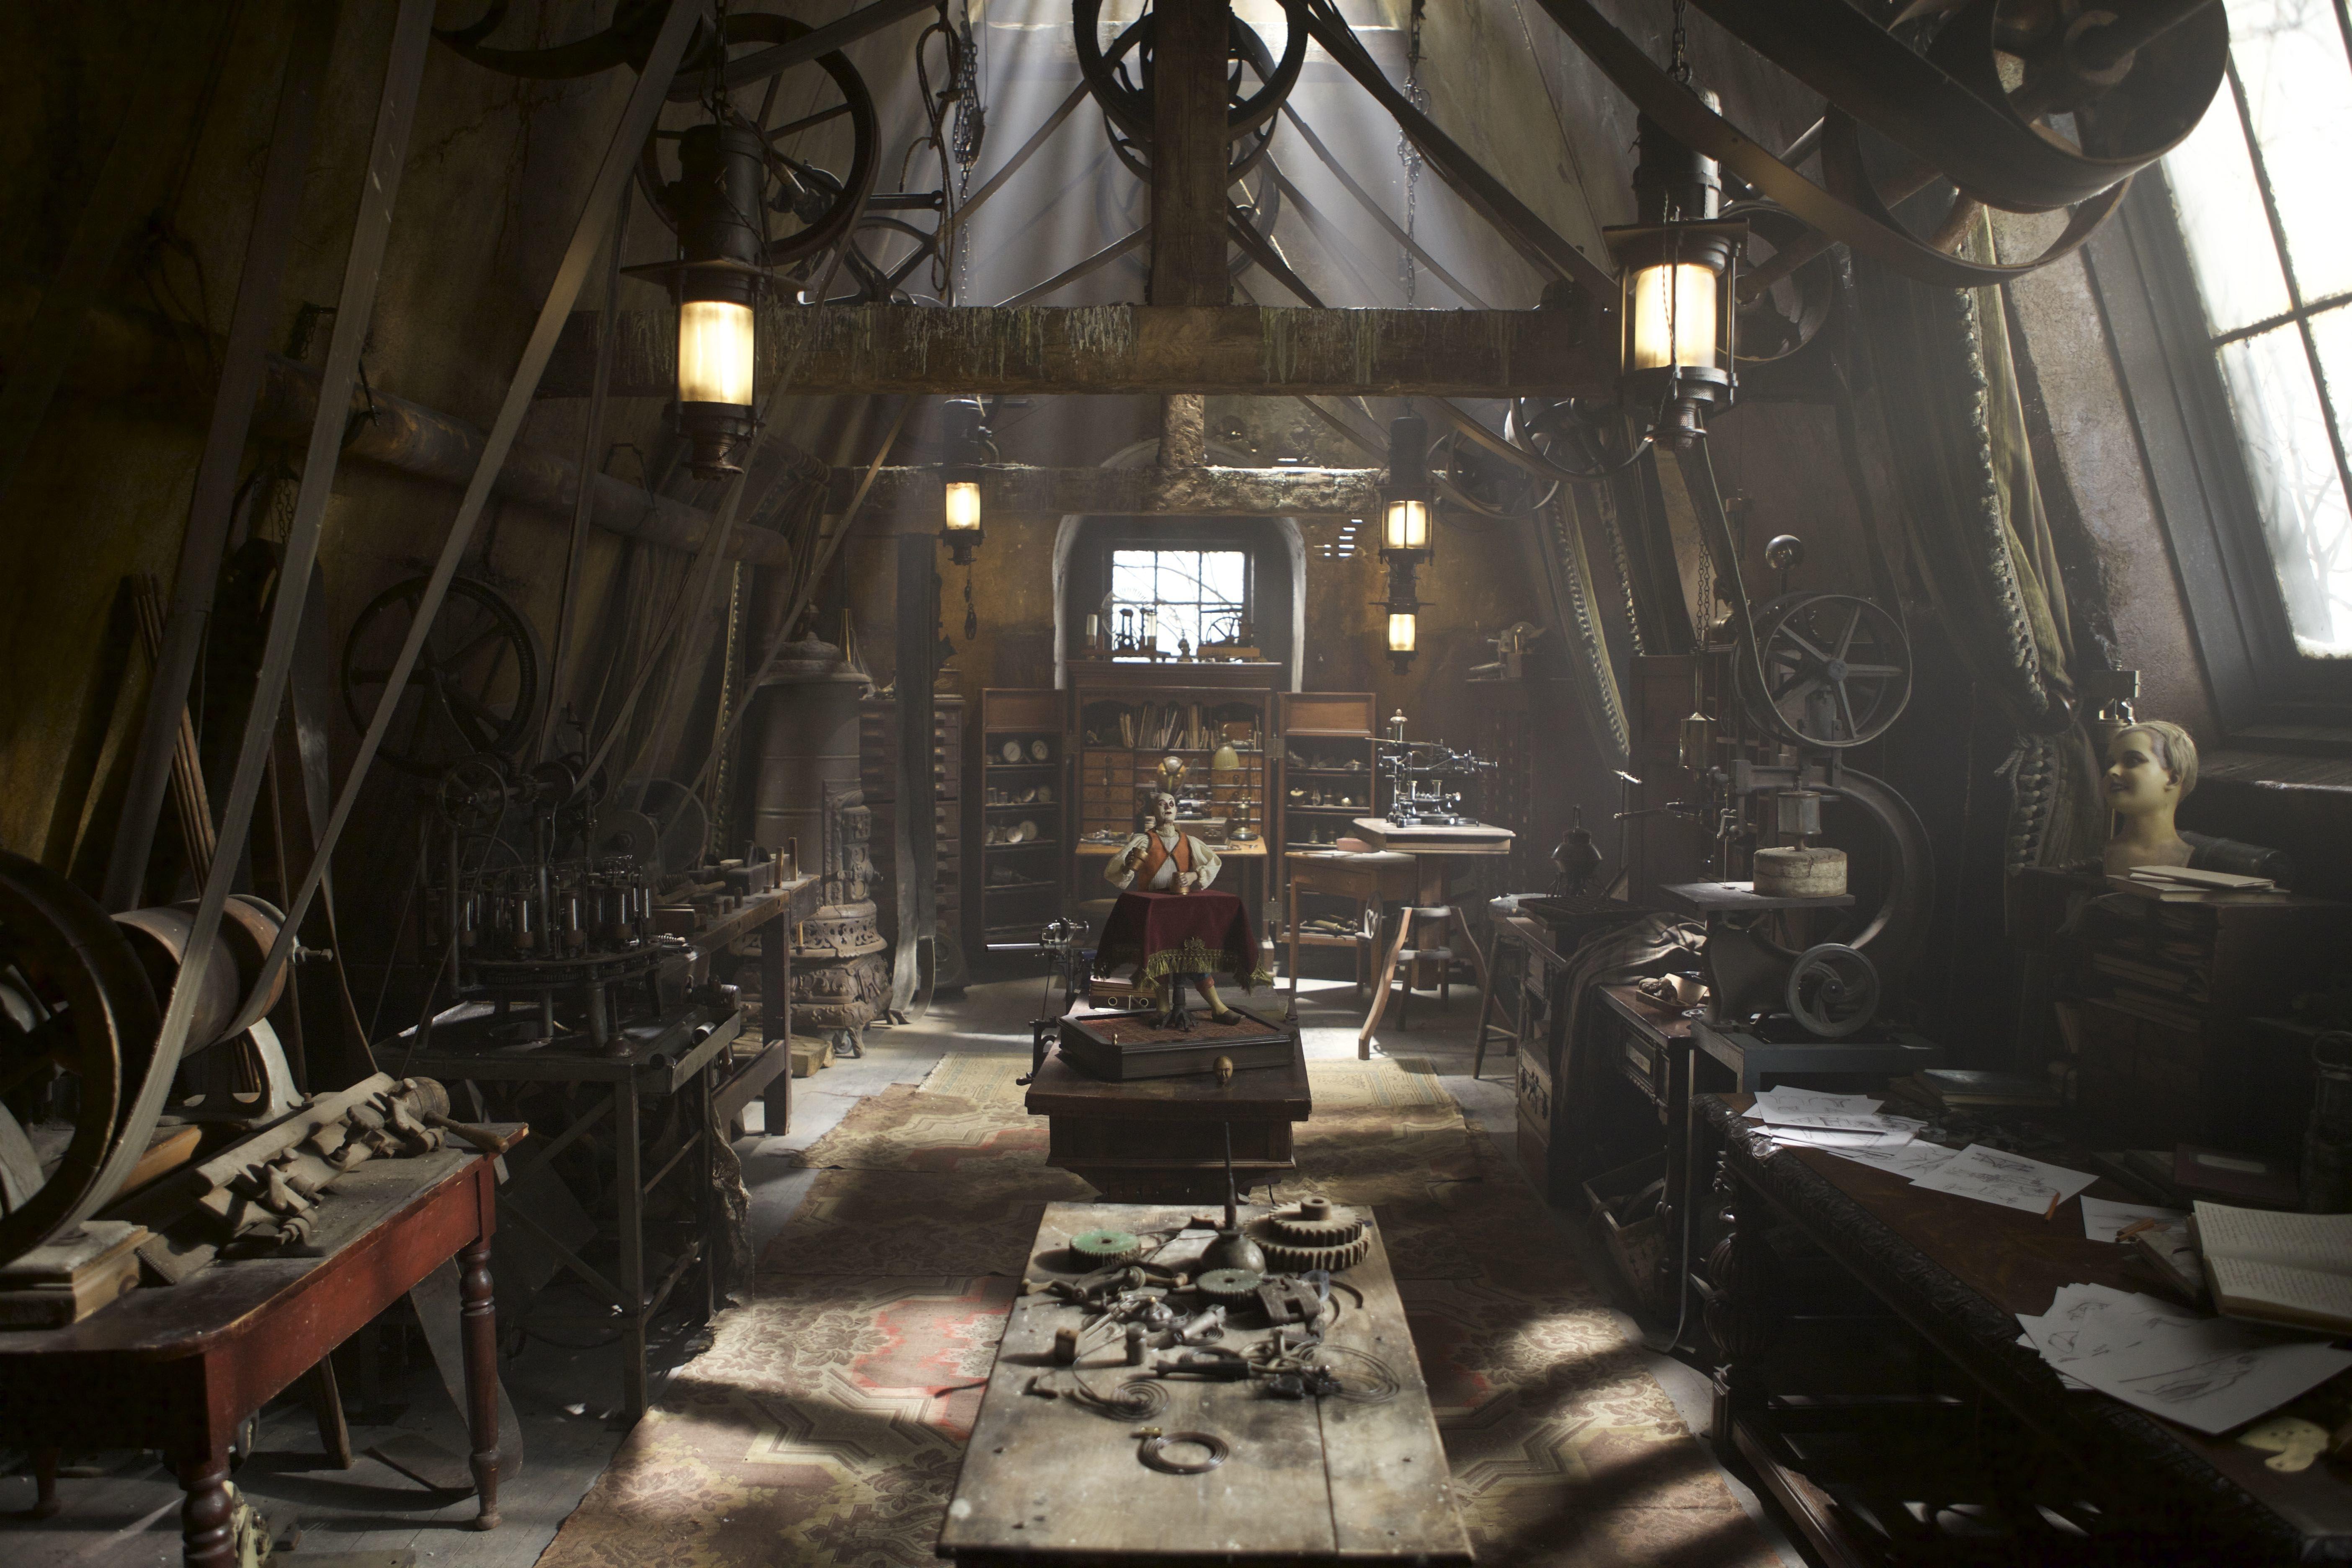 Inside the Beautifully Twisted World of Crimson Peak #productiondesign